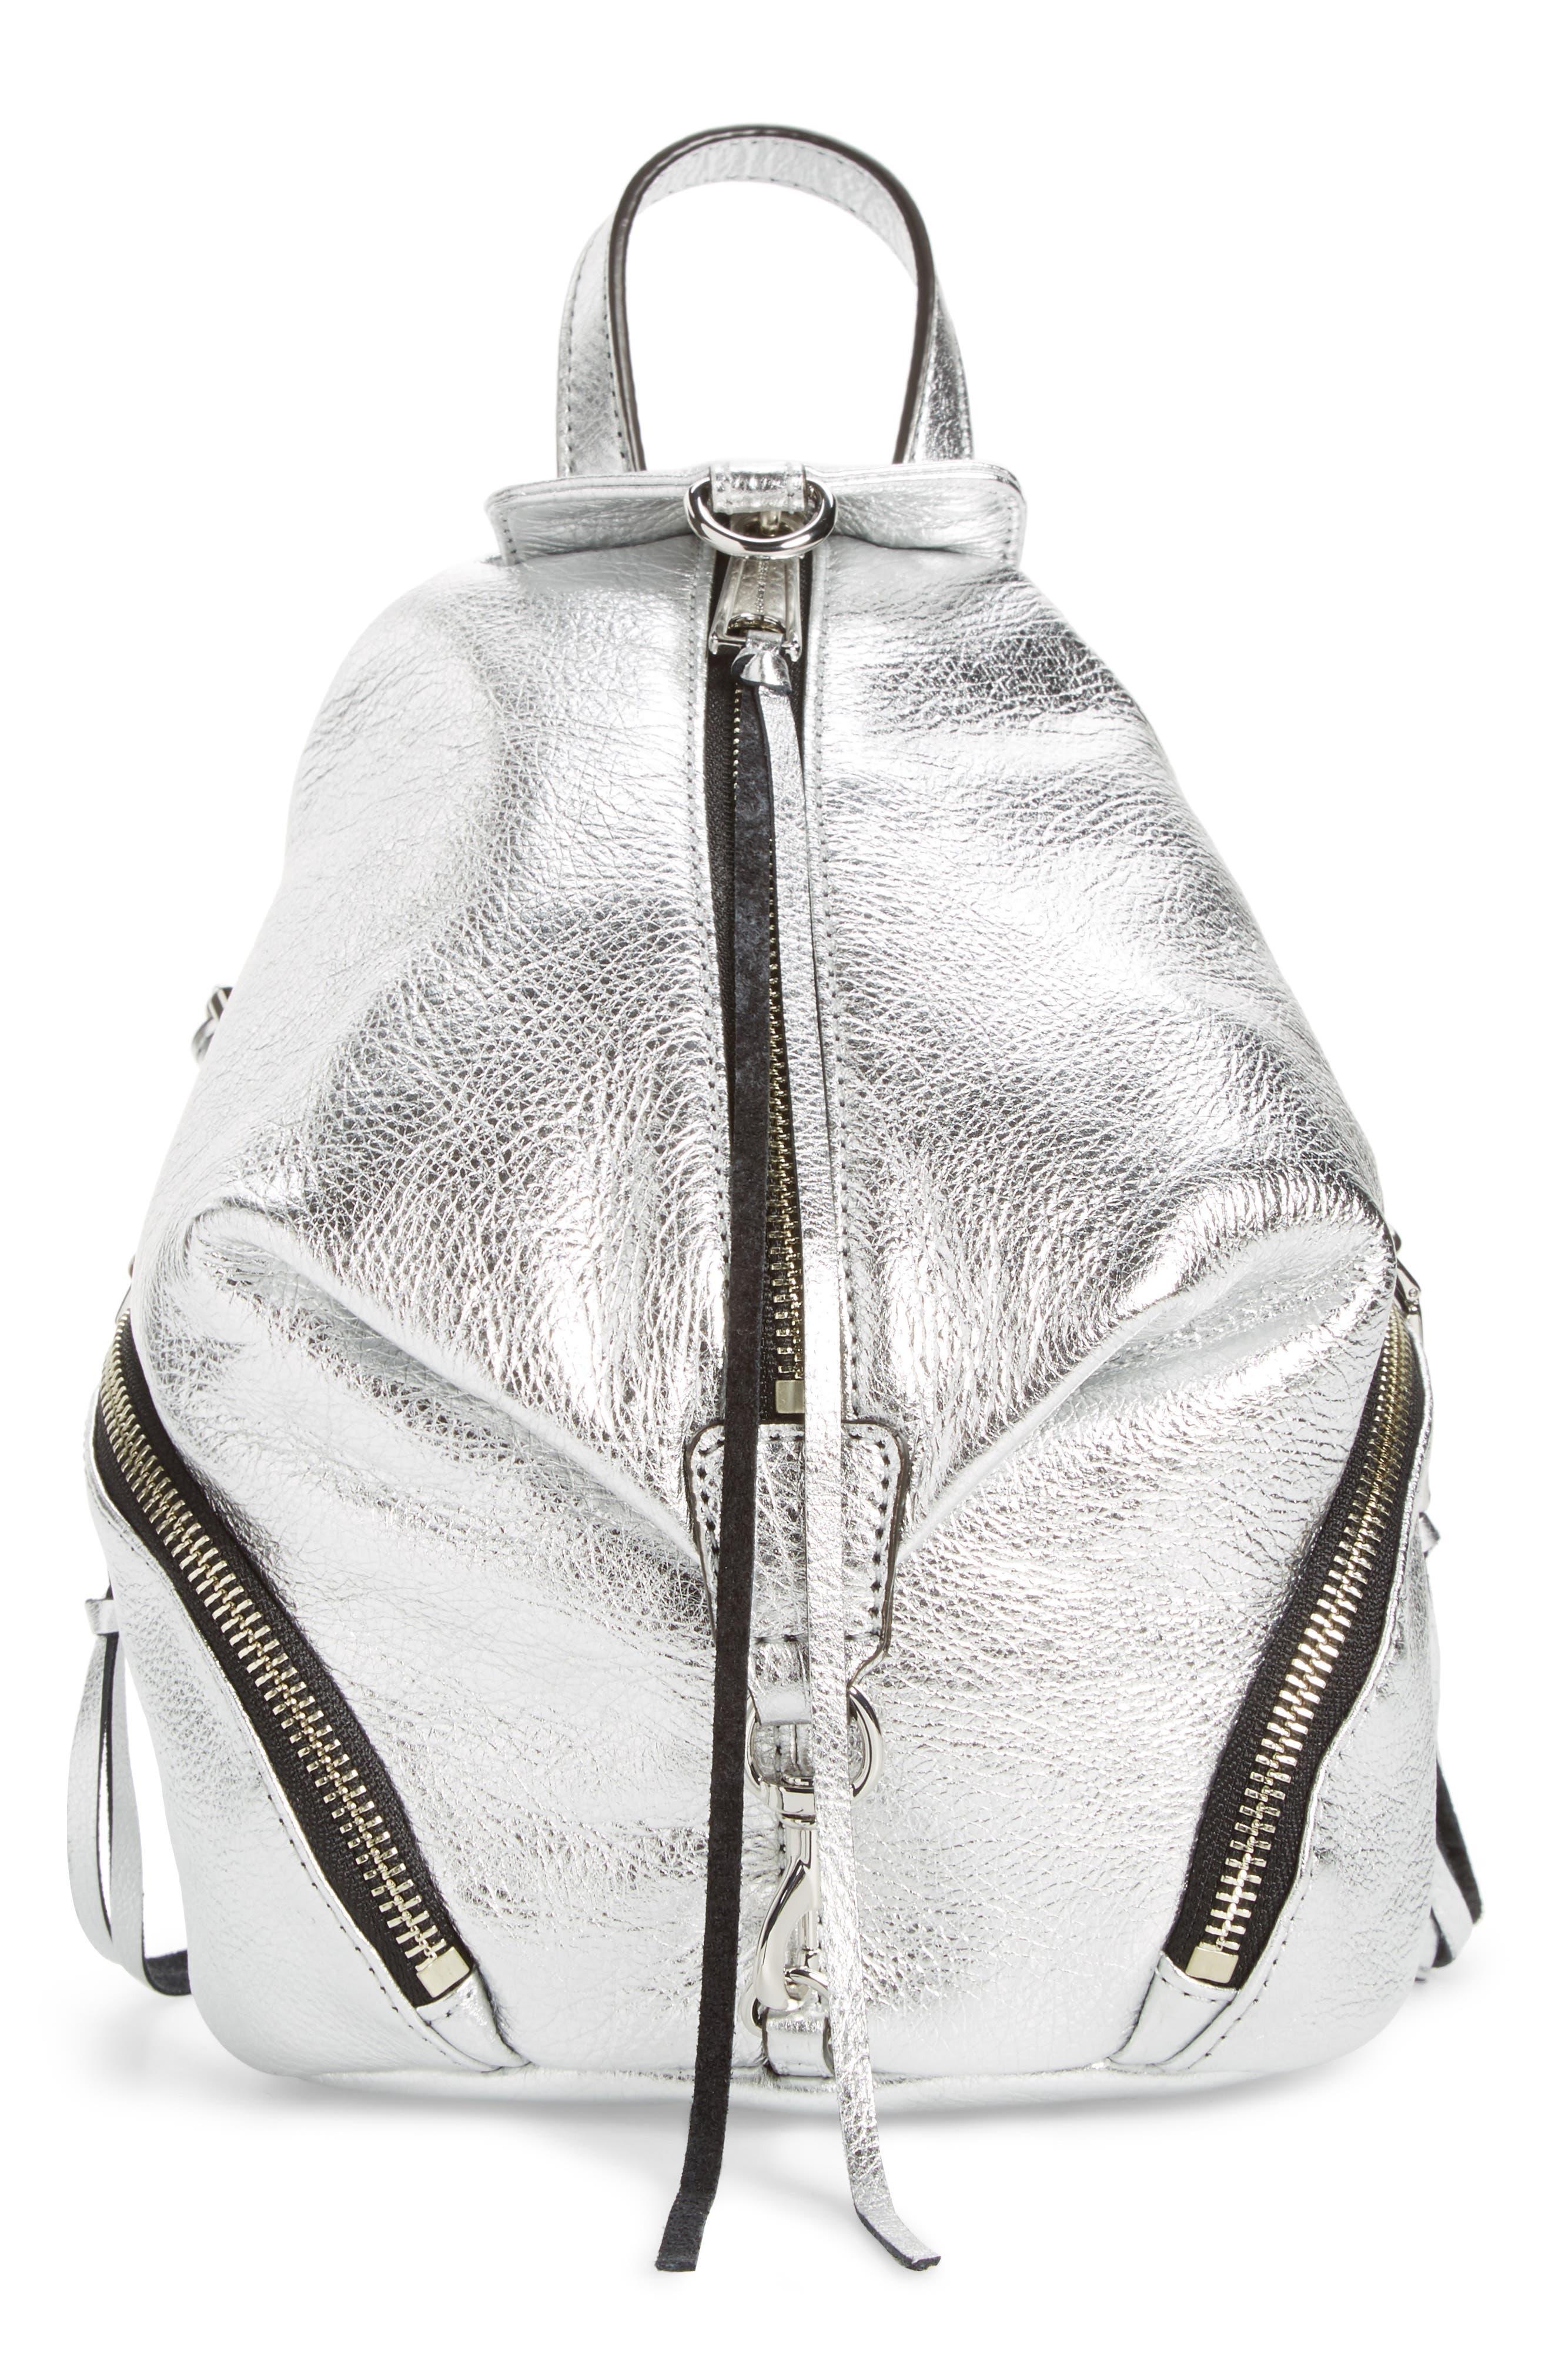 Main Image - Rebecca Minkoff Mini Julian Metallic Leather Backpack